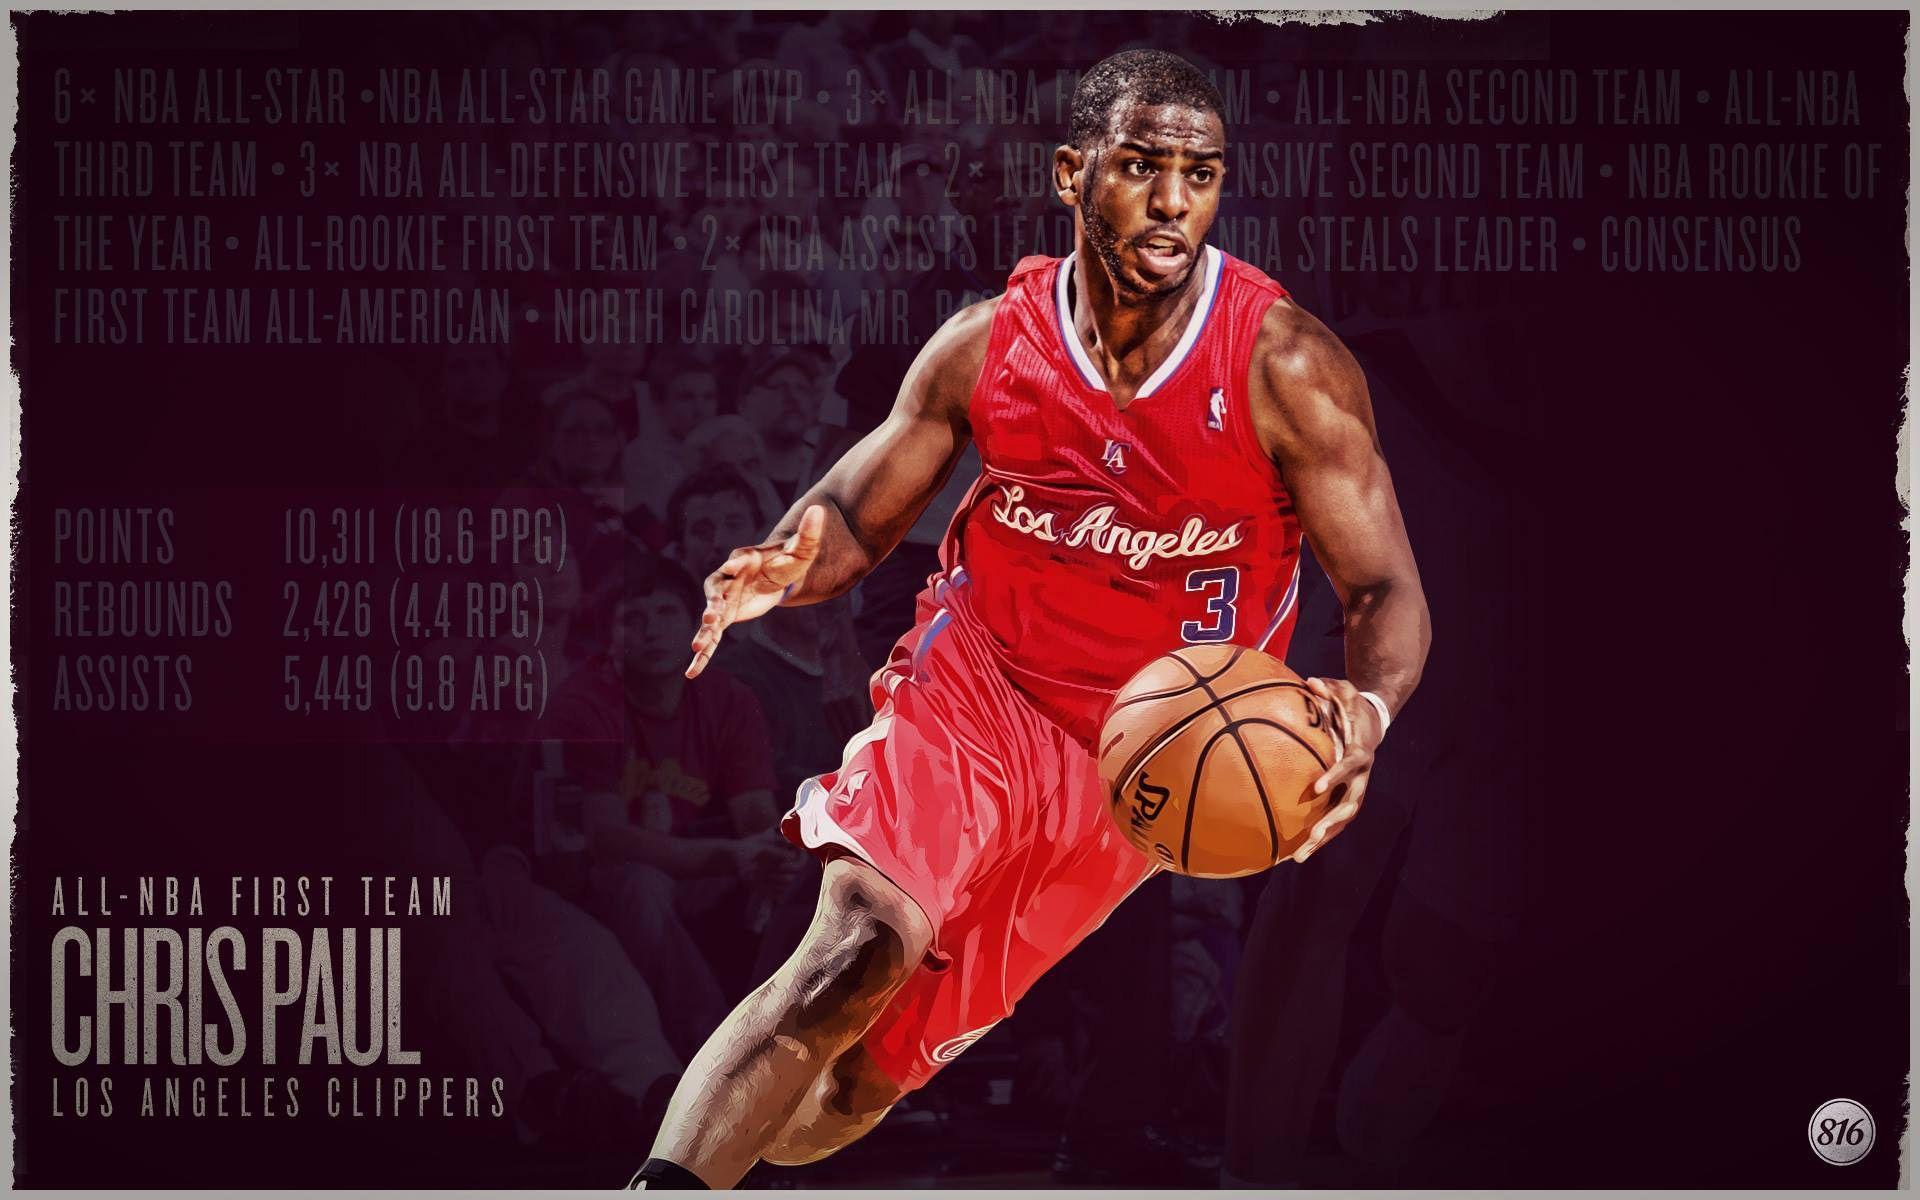 Chris Paul Wallpapers   Basketball Wallpapers at BasketWallpapers.com